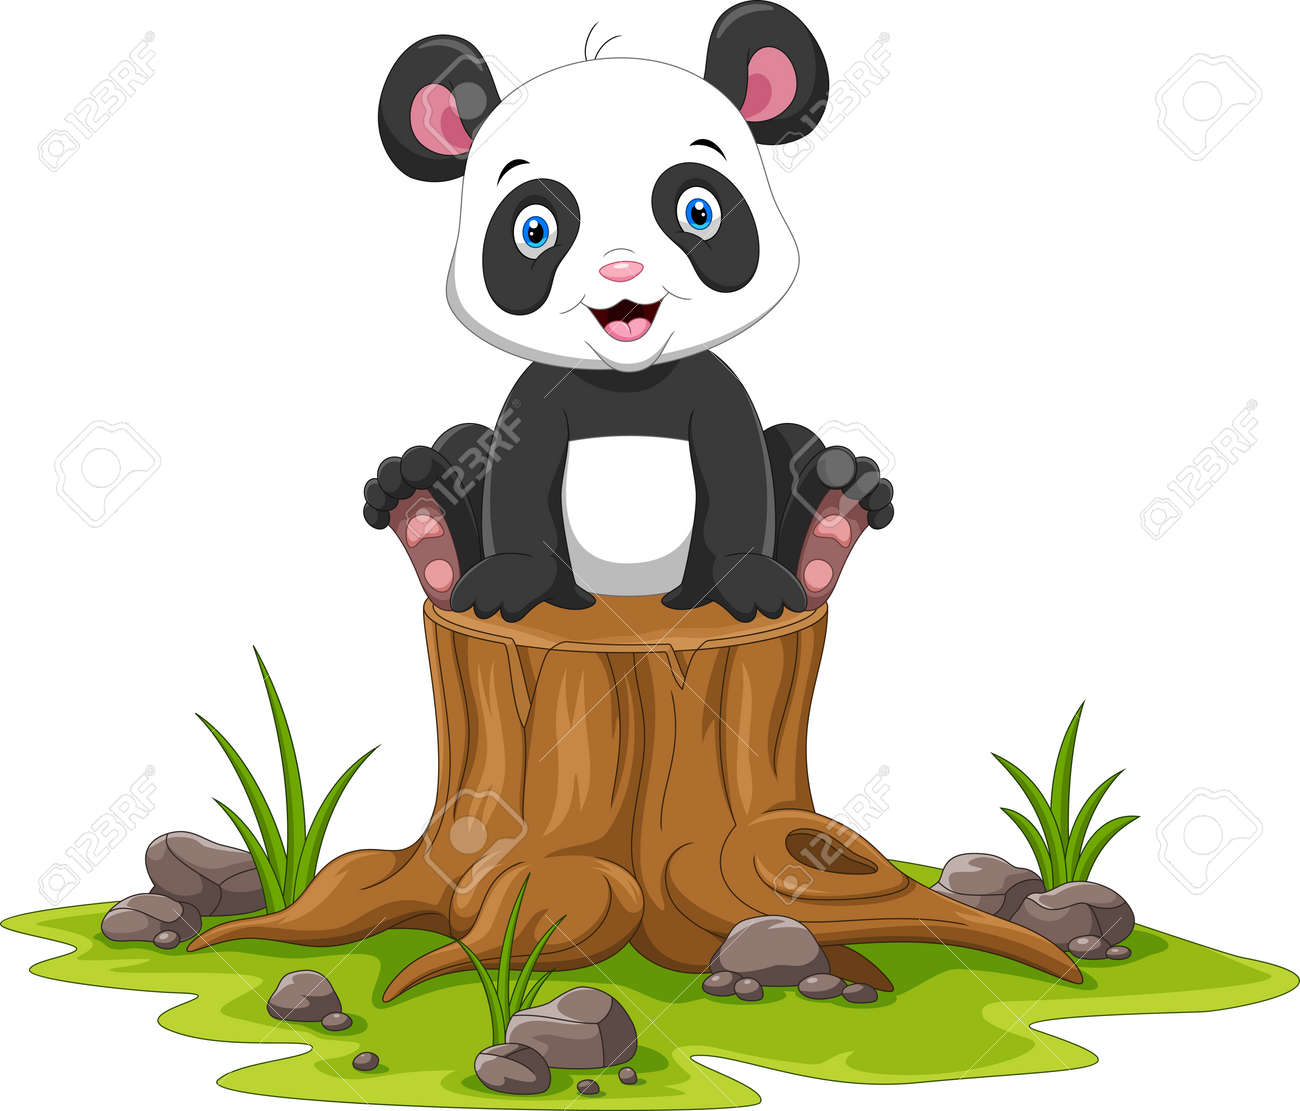 Cartoon happy panda sitting on tree stump - 165285554